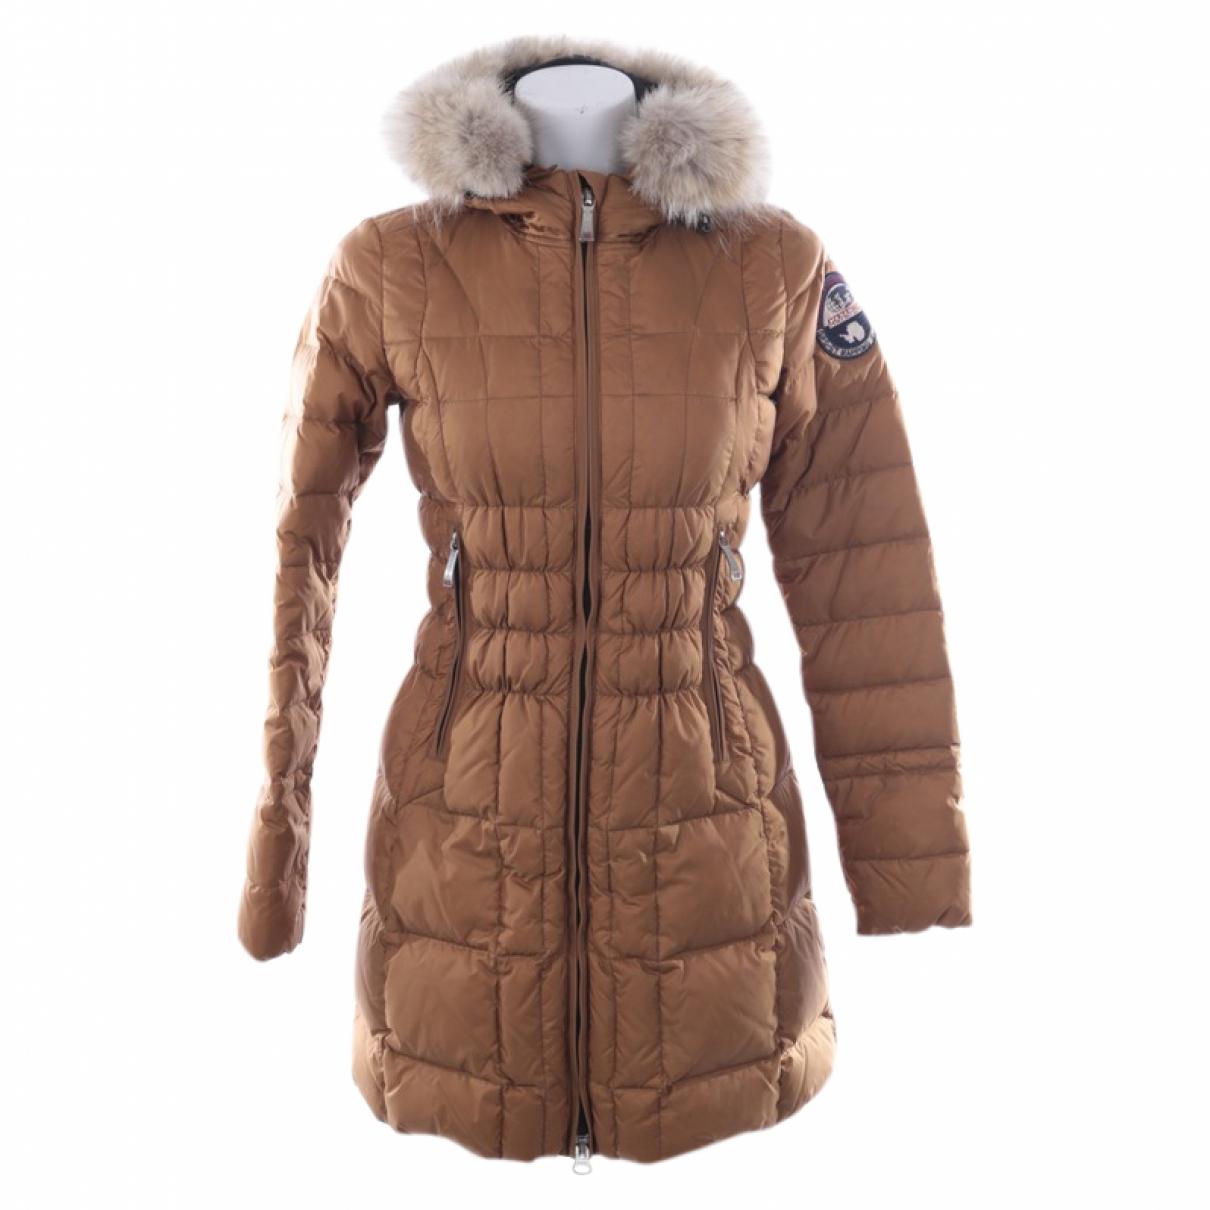 Napapijri \N Brown jacket for Women XS International